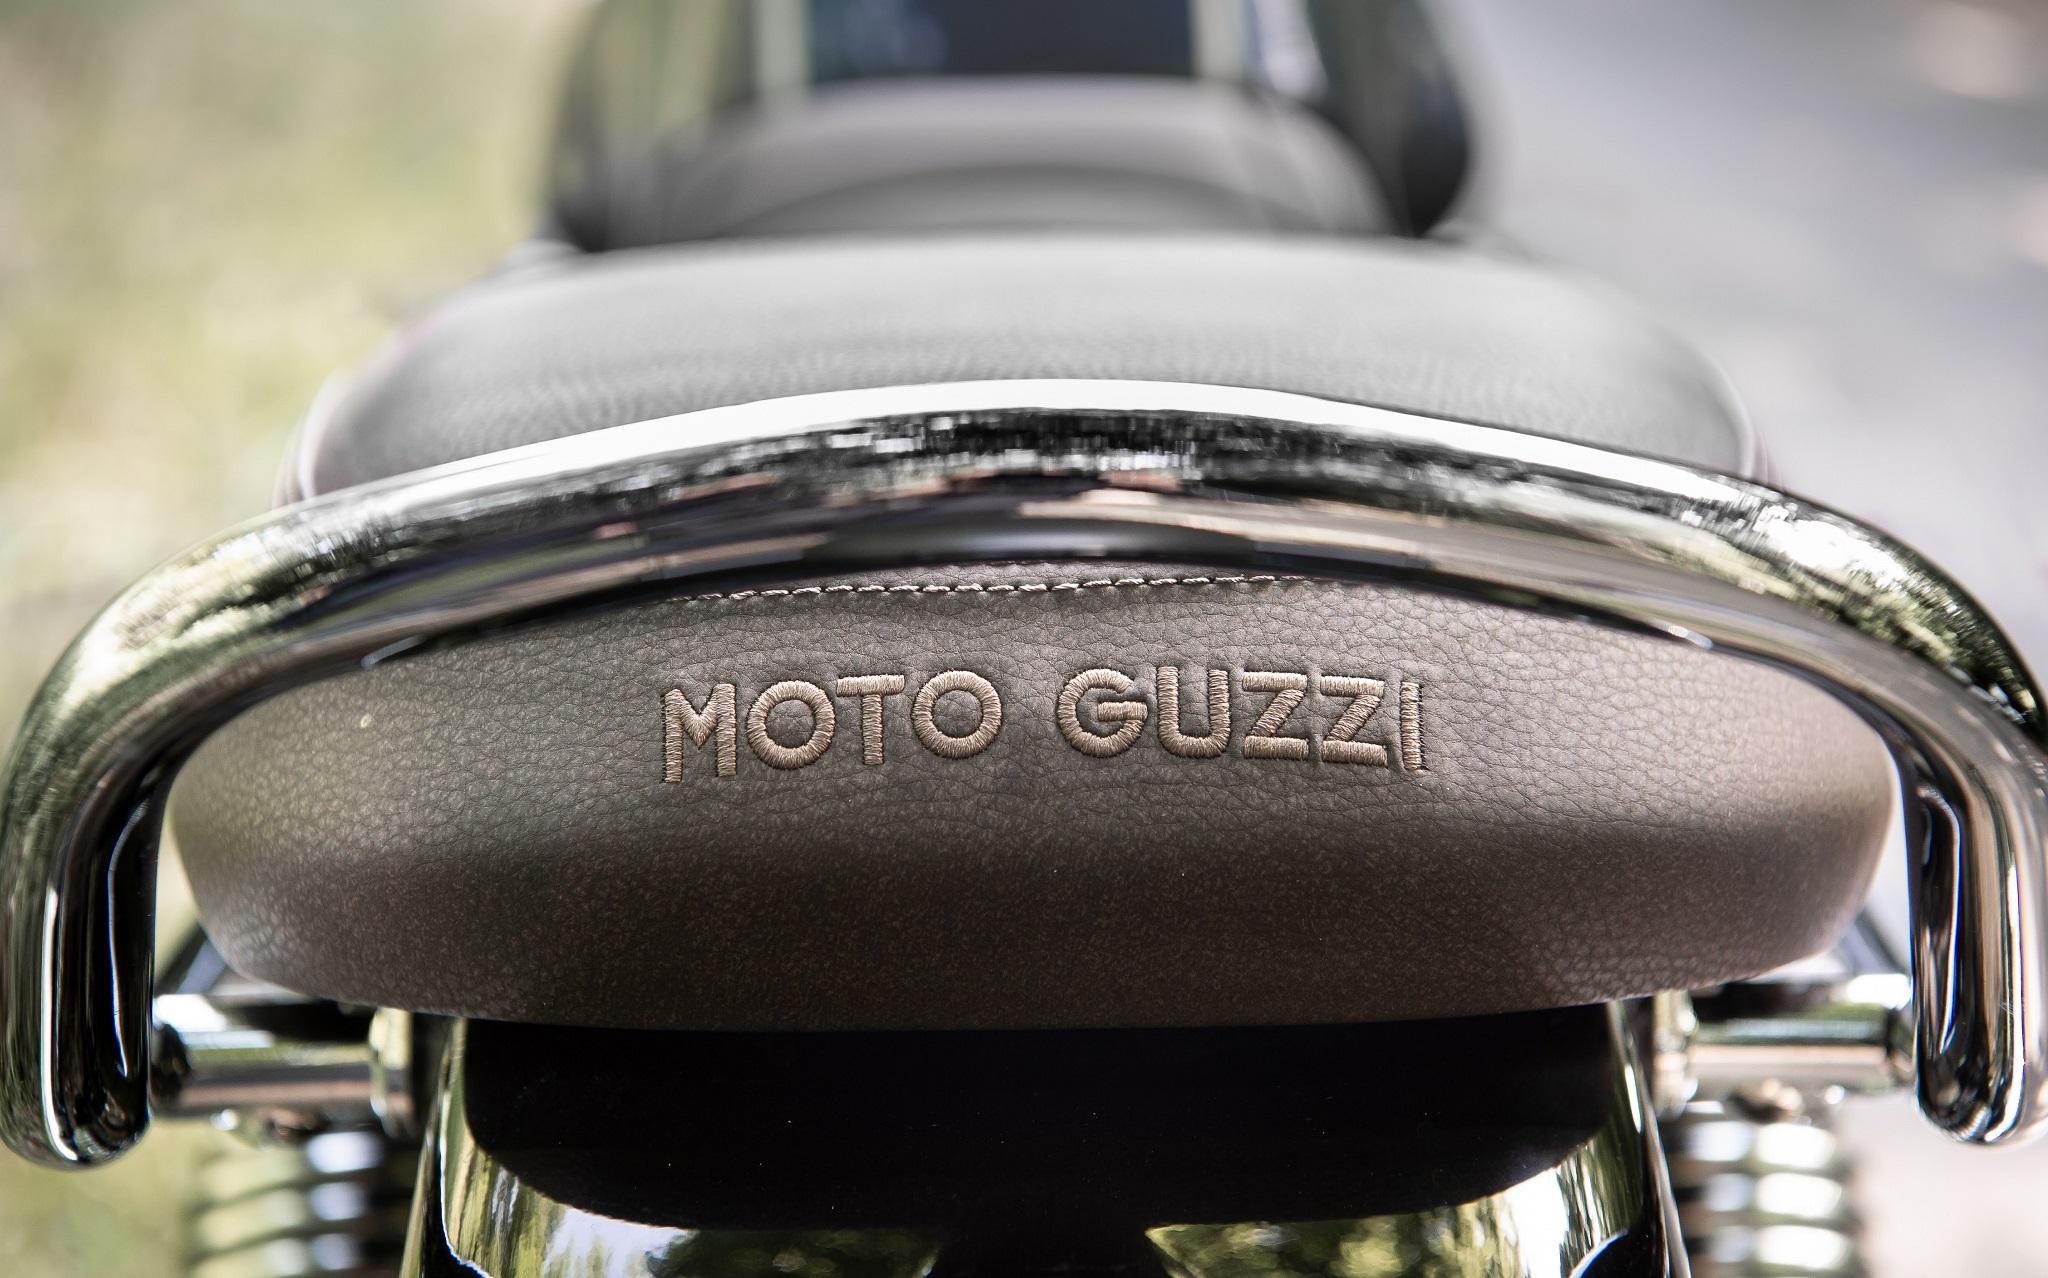 Moto Guzzi selle